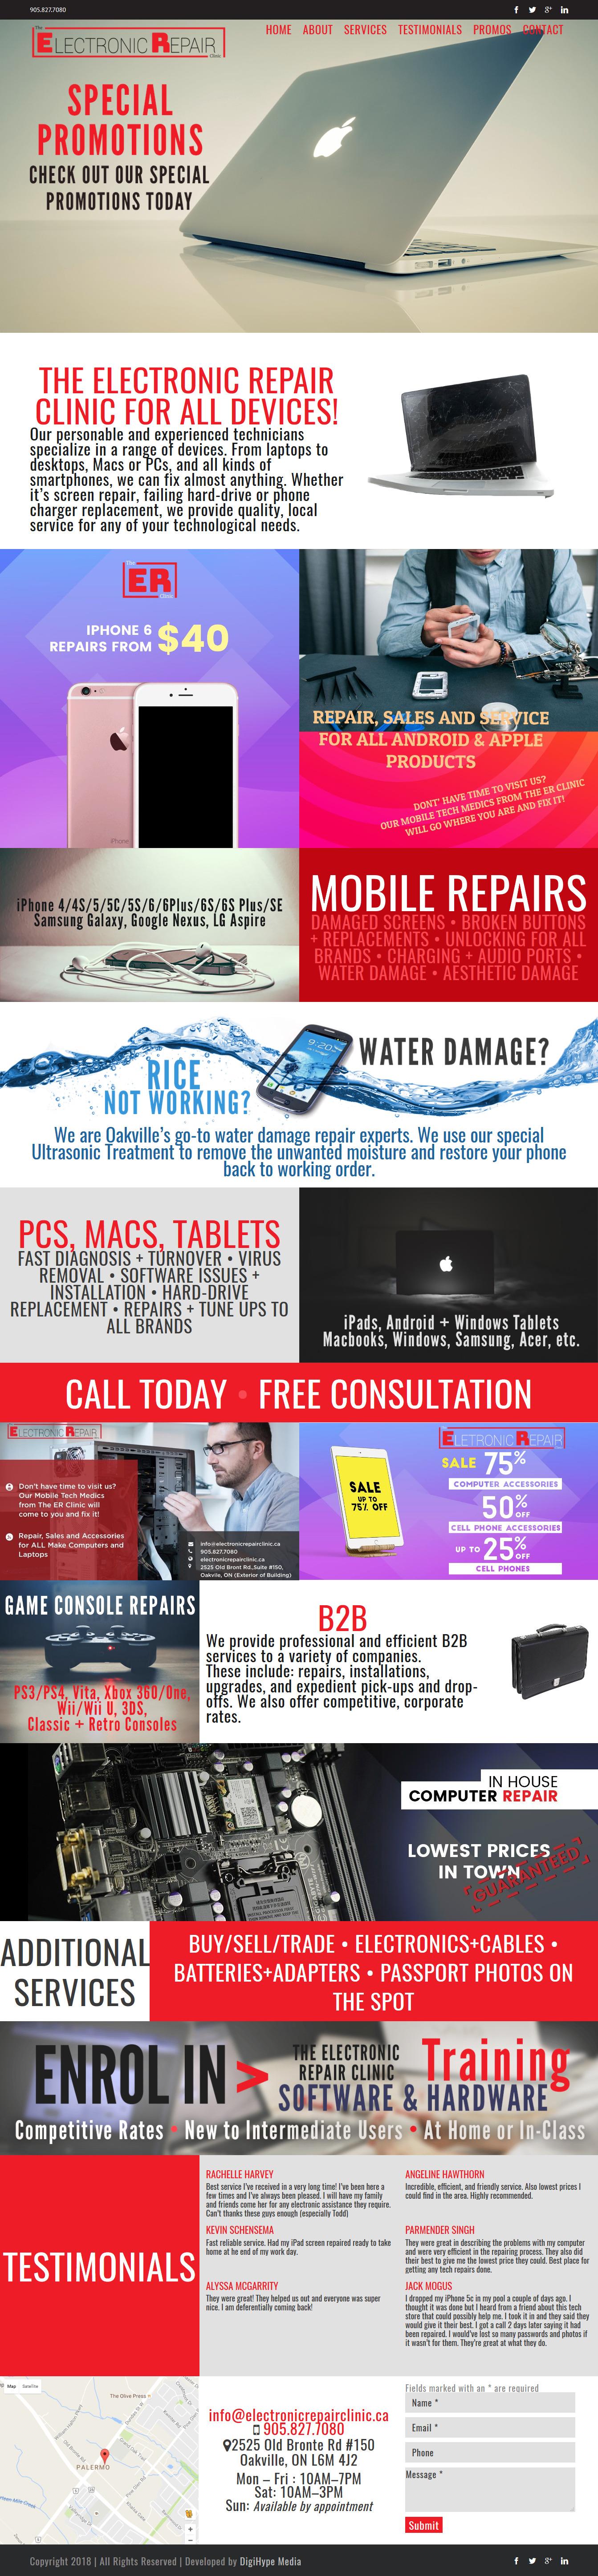 Tablet, phone and computer repair in Oakville (website development & website design mockup)